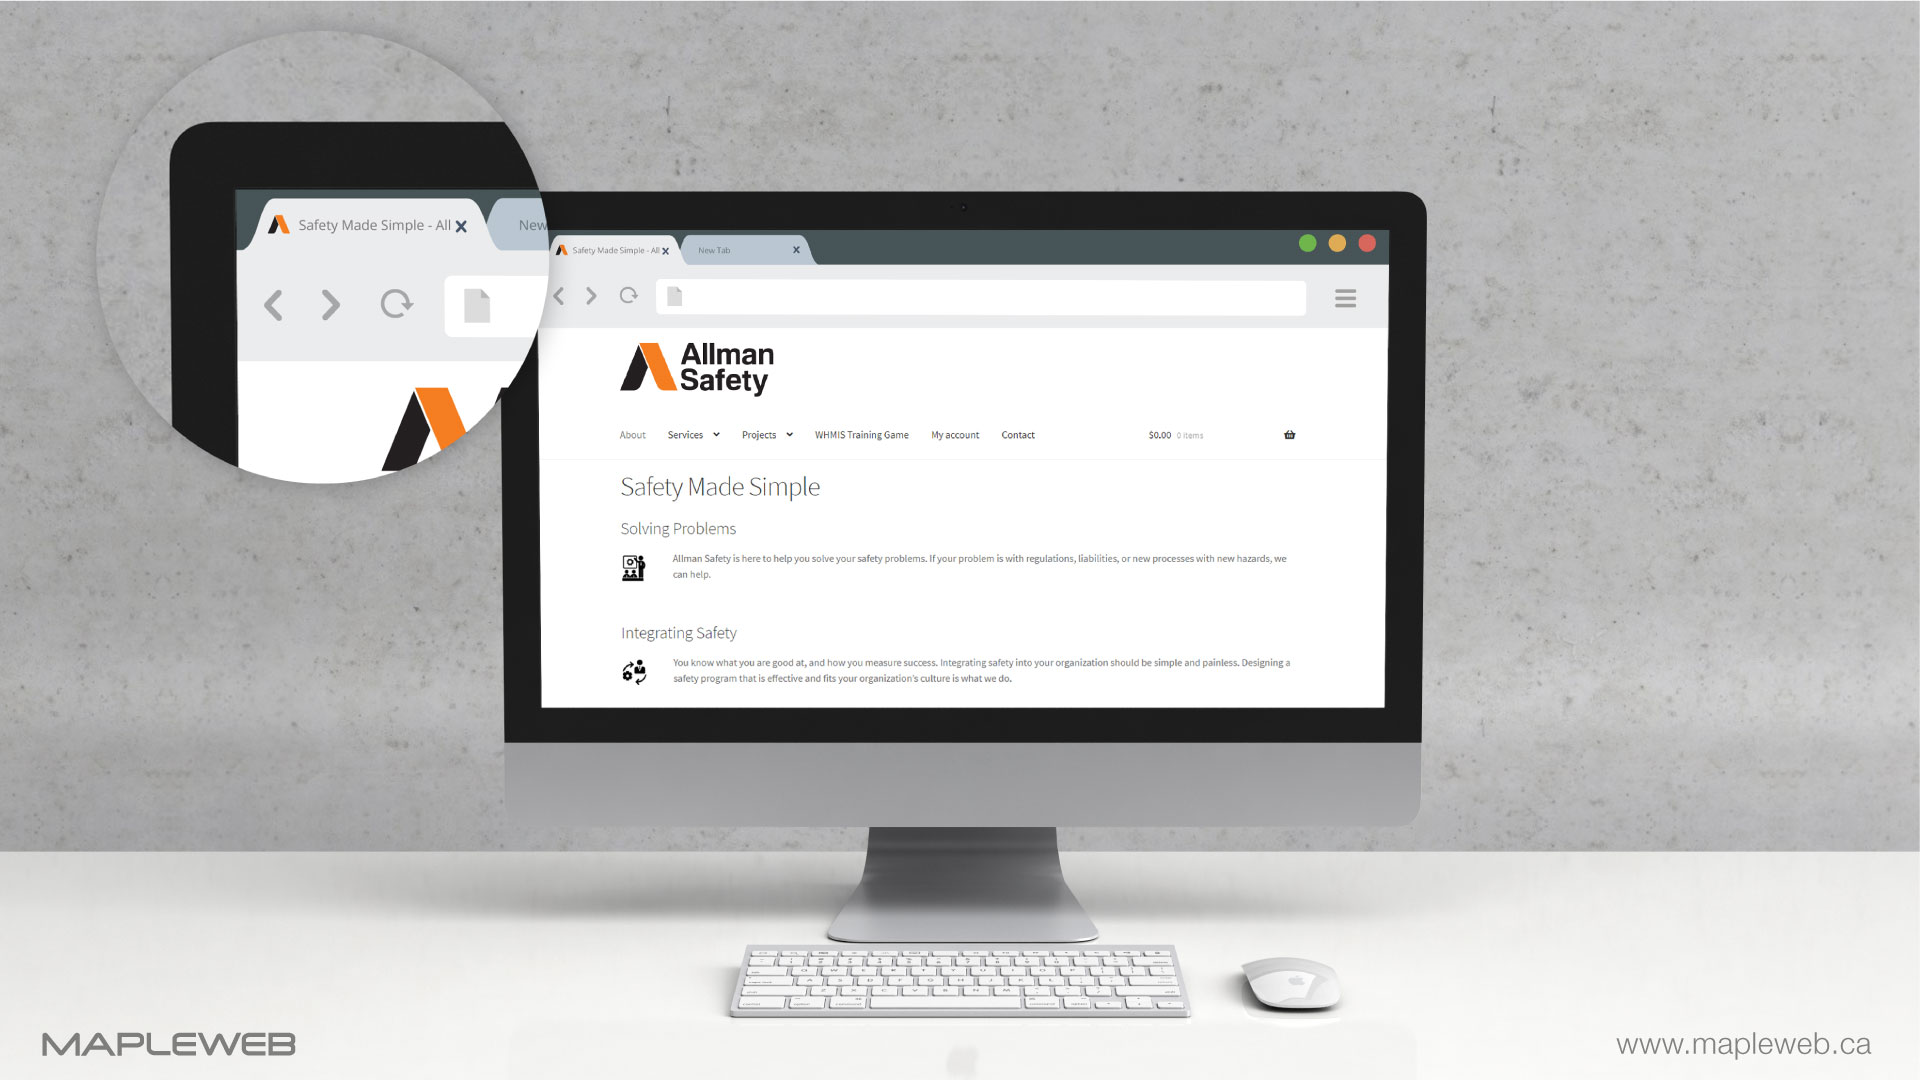 allman-safety-brand-logo-design-by-mapleweb-vancouver-canada-title-icon-on-google-tab-bar-mock